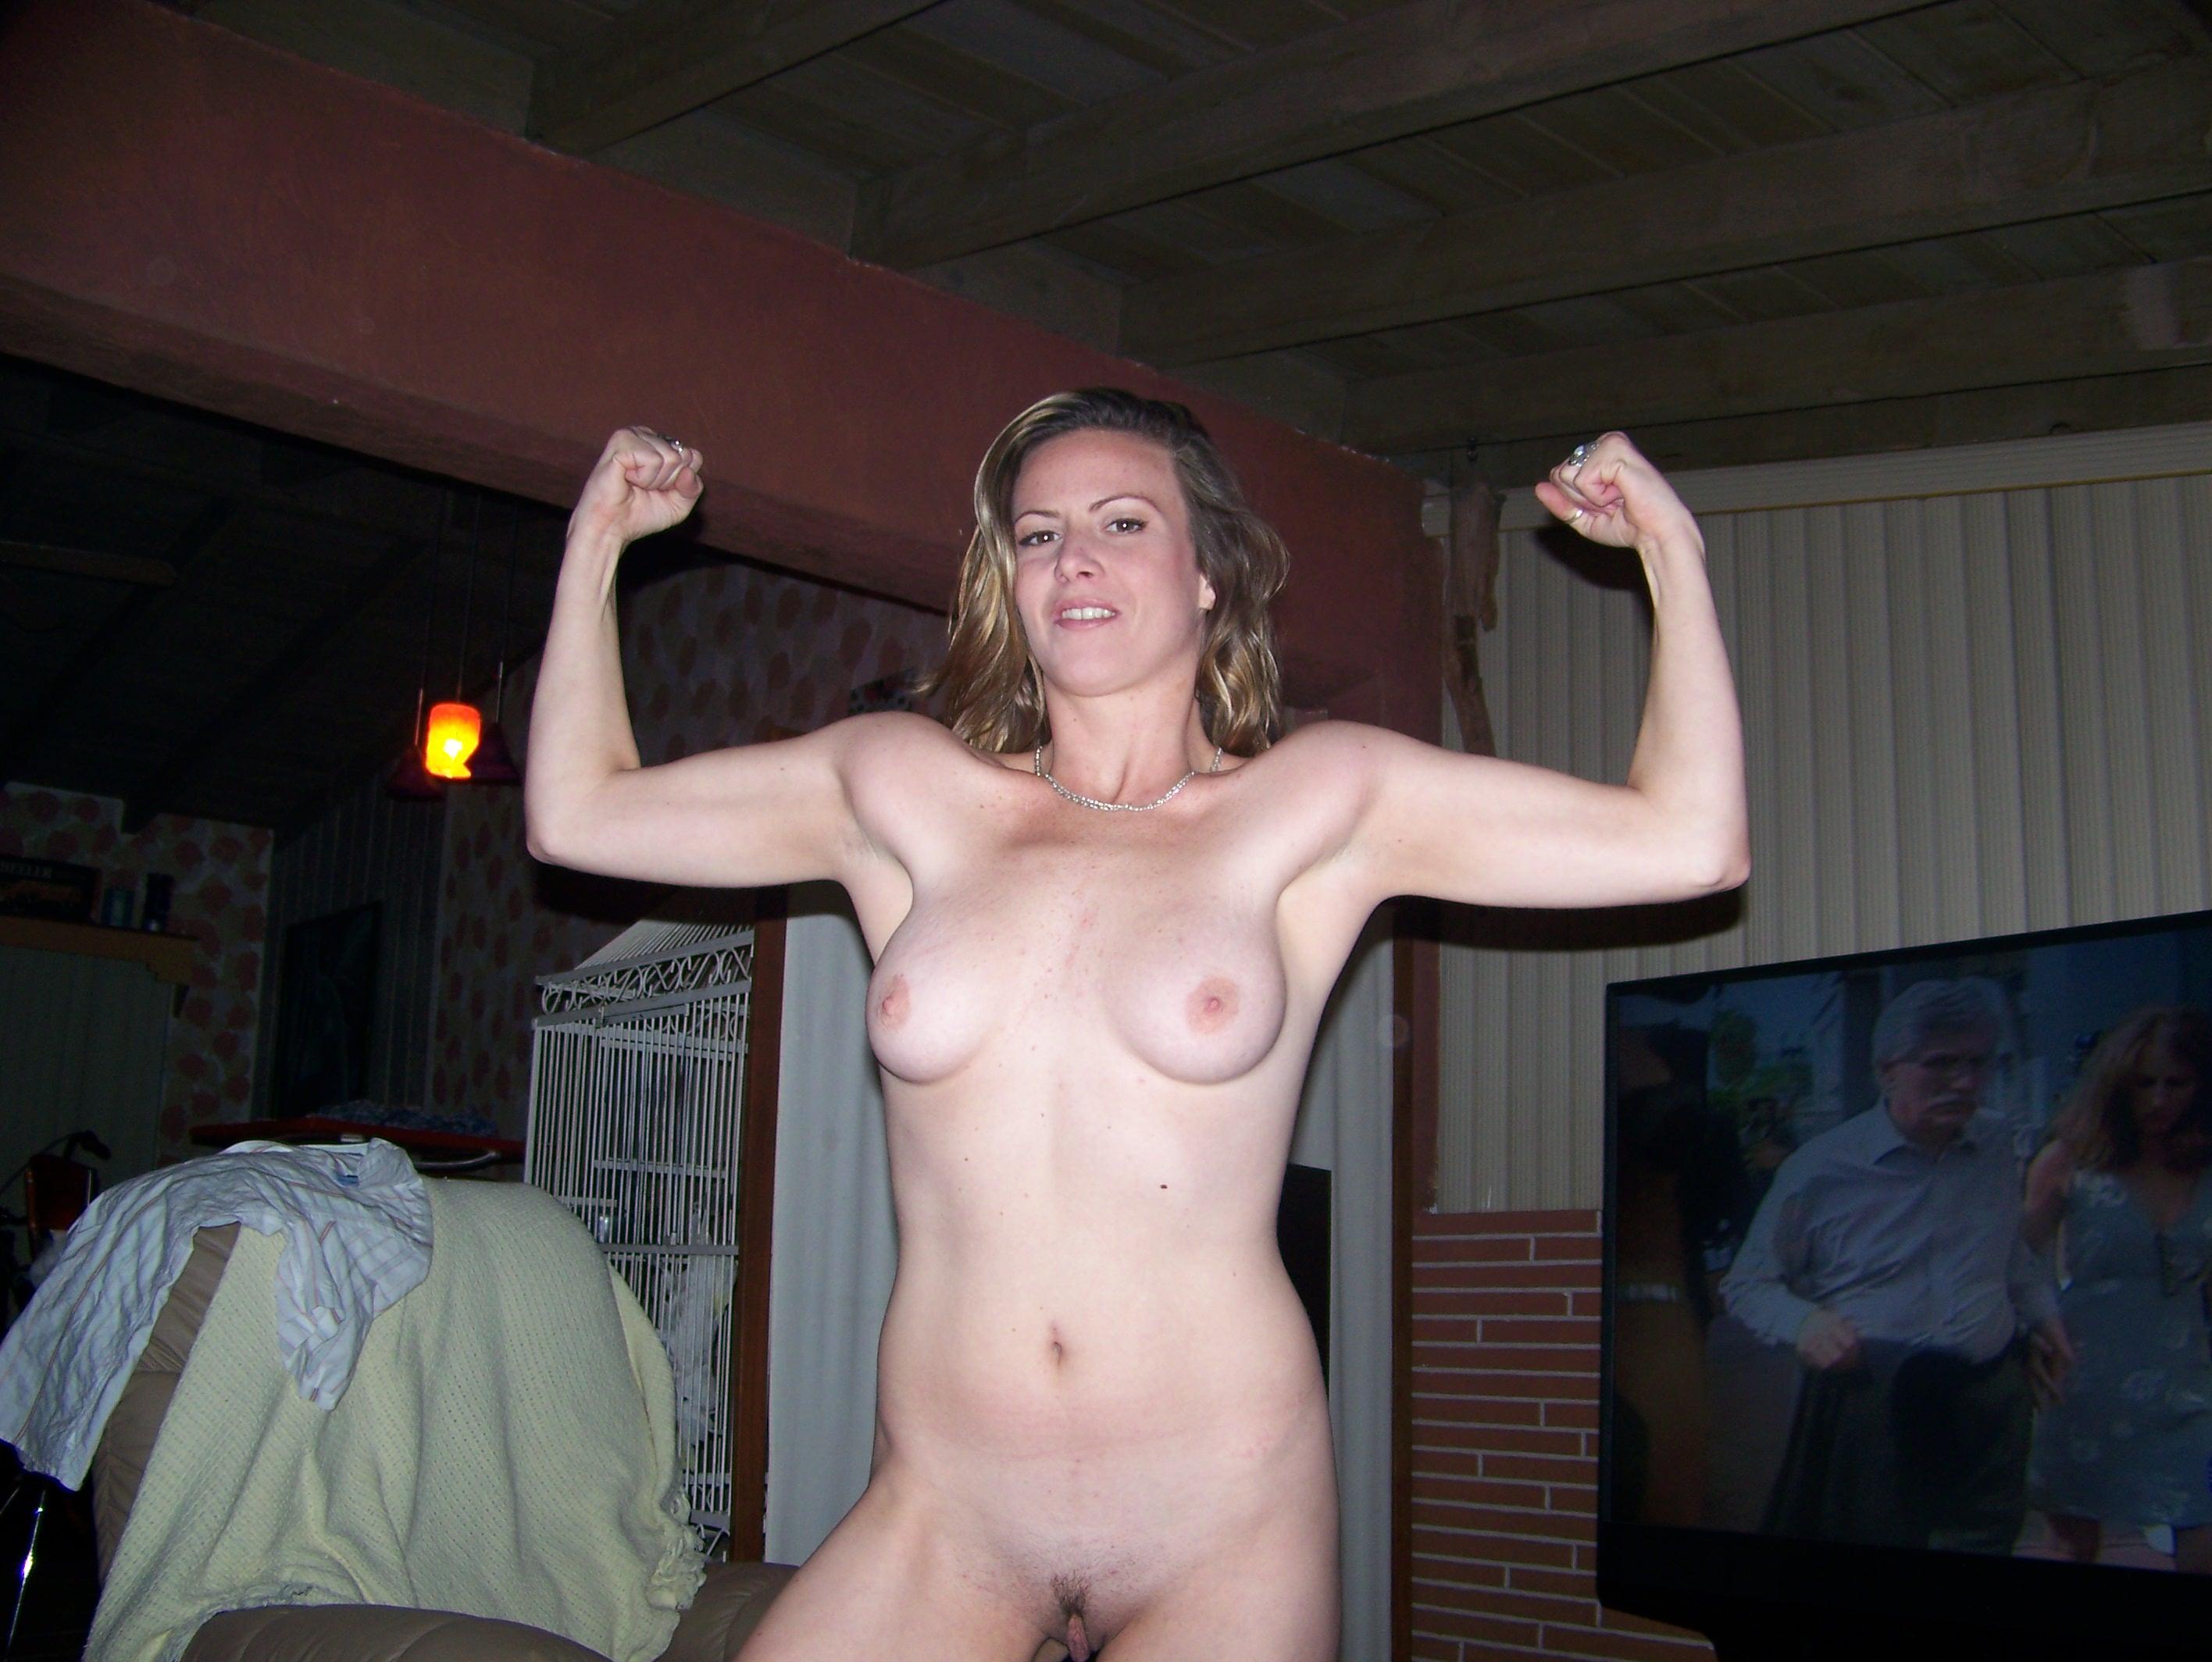 Free amateur wife nude posting